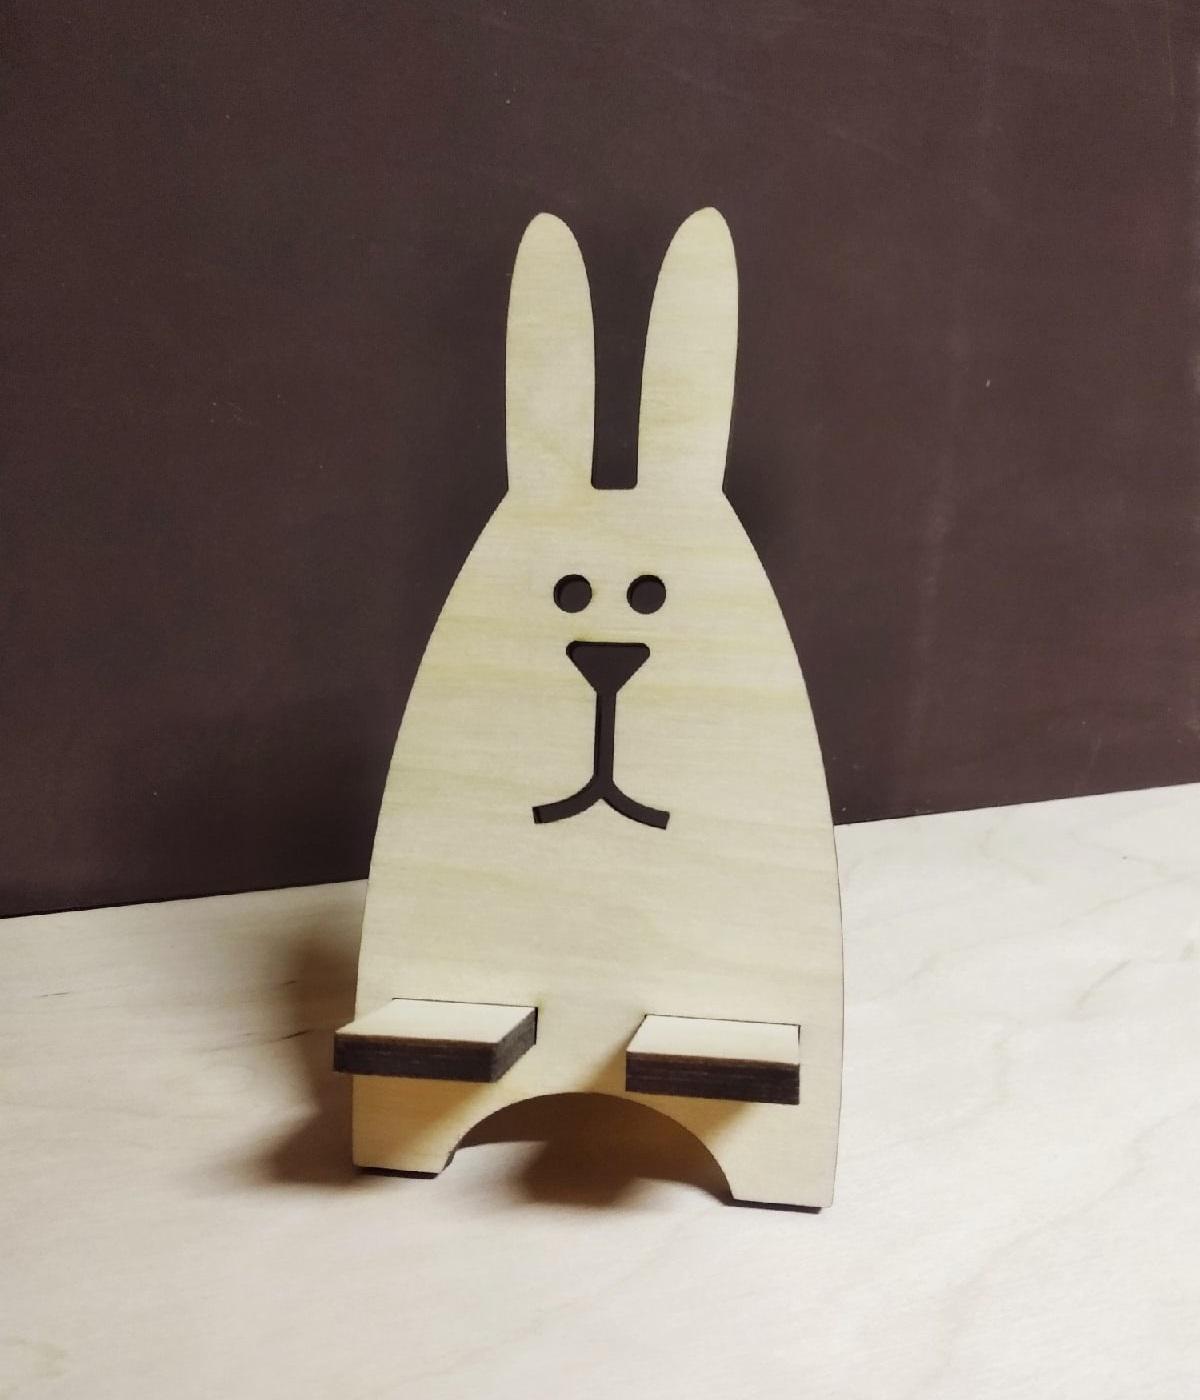 Laser Cut Creative Cute Rabbit Desktop Phone Stand Free Vector